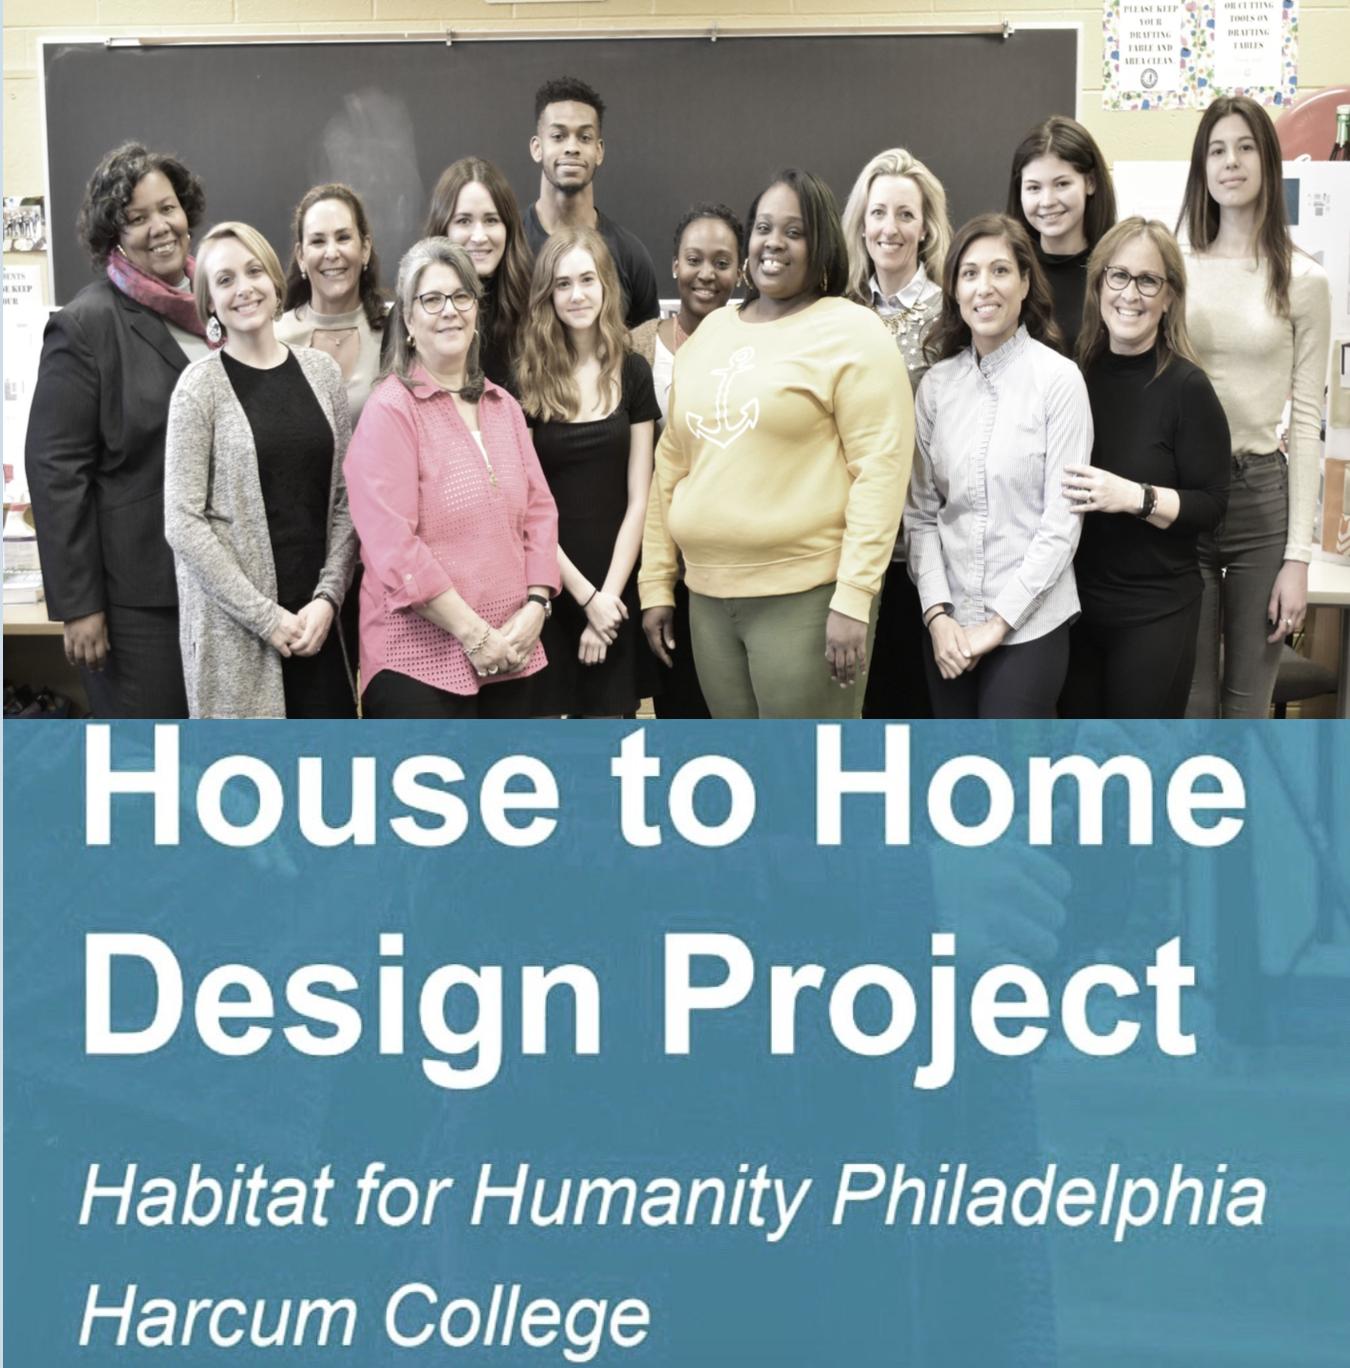 Harcum College interior design students, teachers and habitat staff with Latasha.Click image for student presentations.